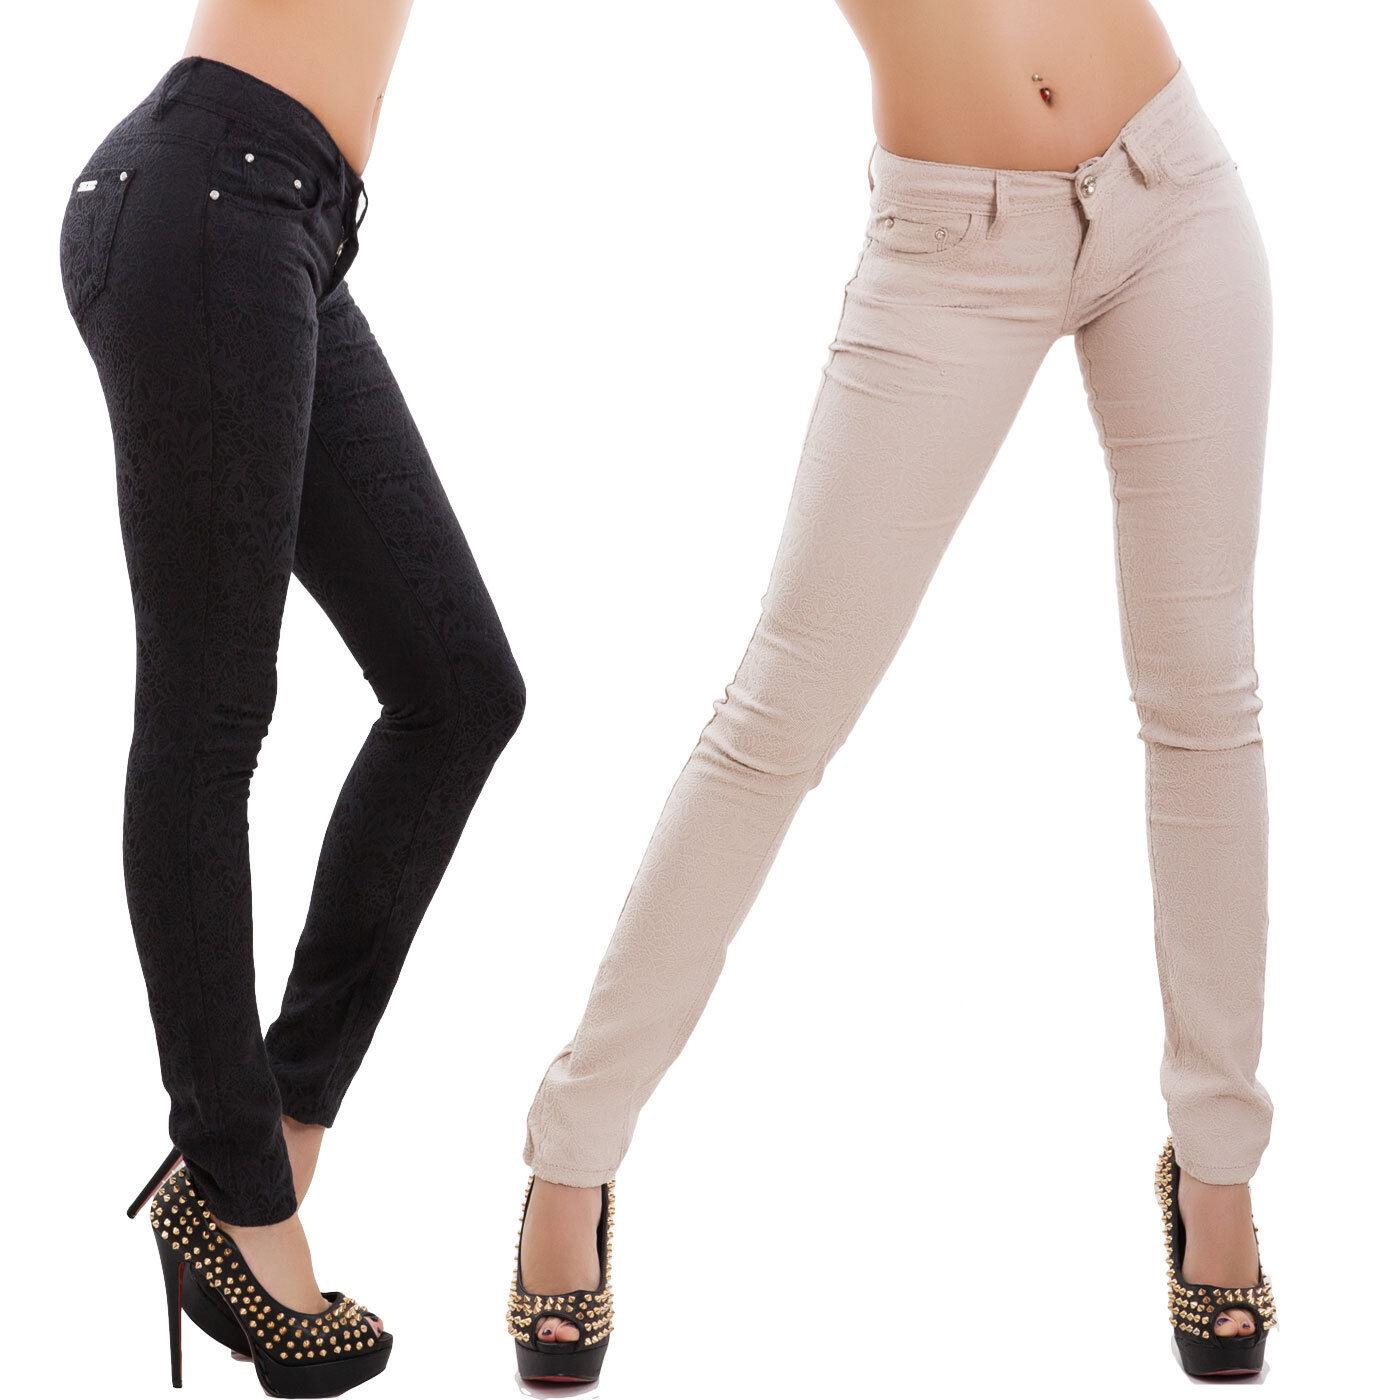 Pantalones de women pitillo slim encaje bordado tapicería talle bajo AR-676